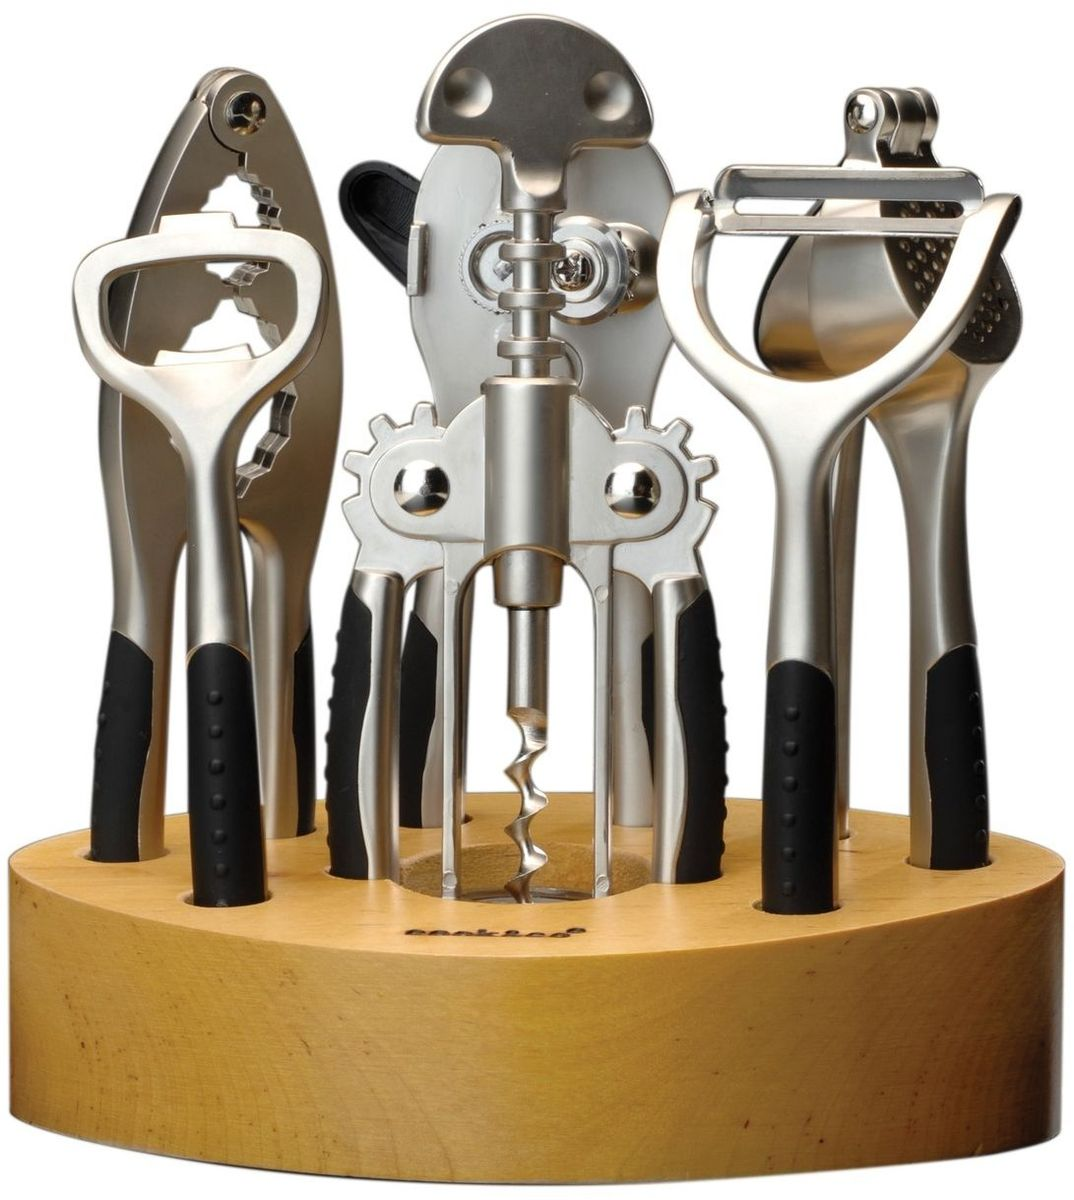 Набор для кухни и бара BergHOFF Cook&Co, 7 предметов2800713